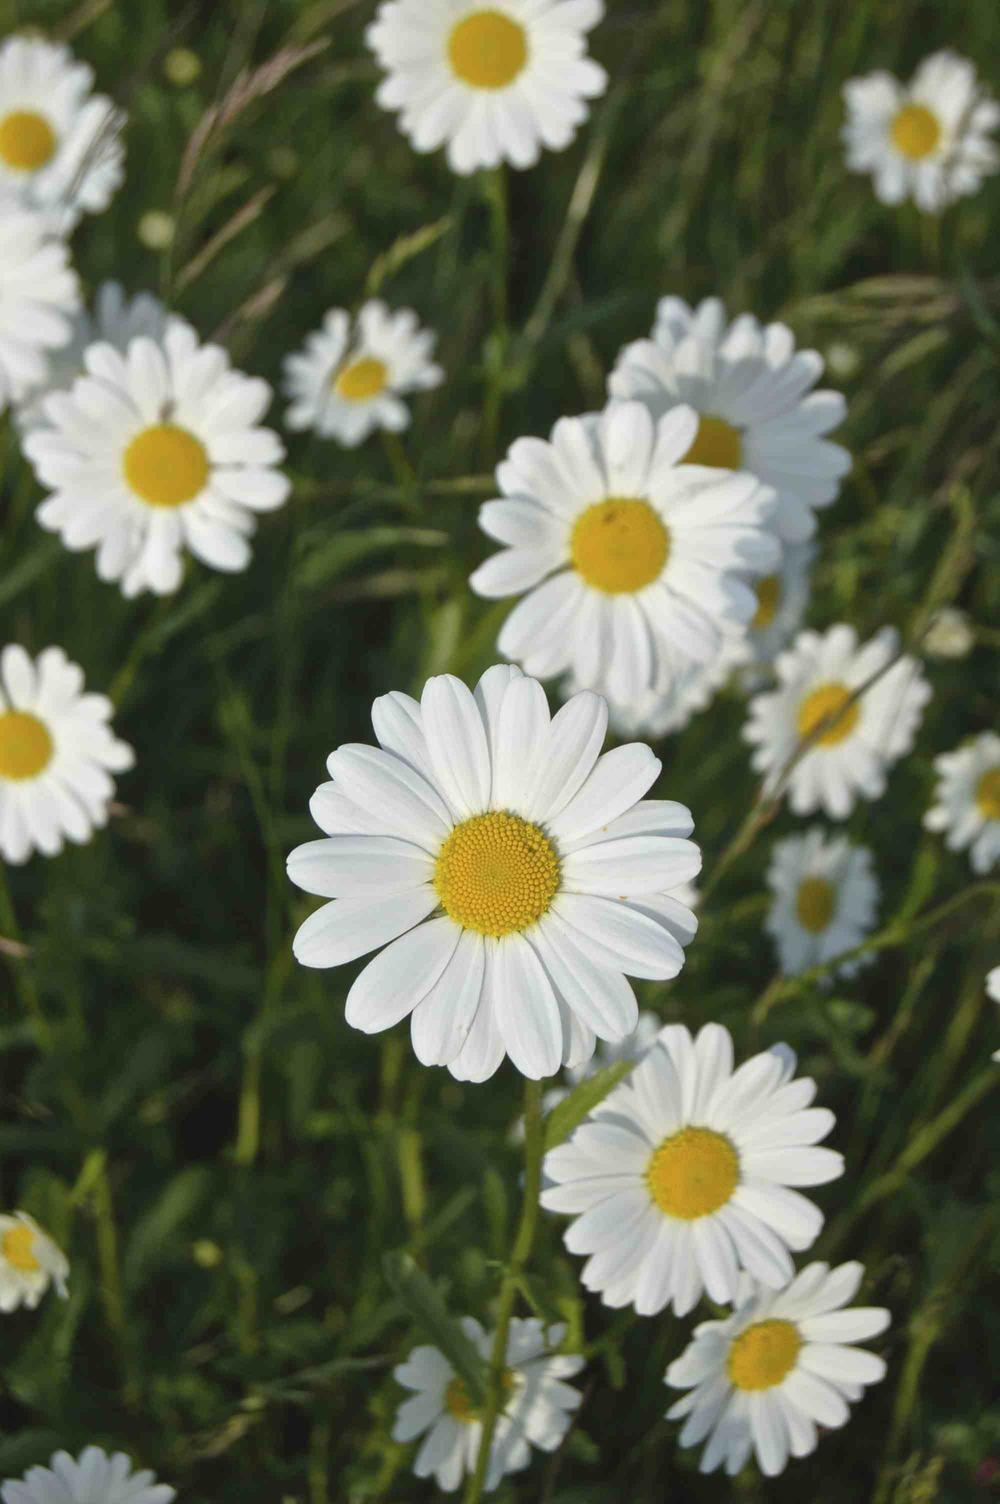 Oxe-eye daisy (Heliopsis)